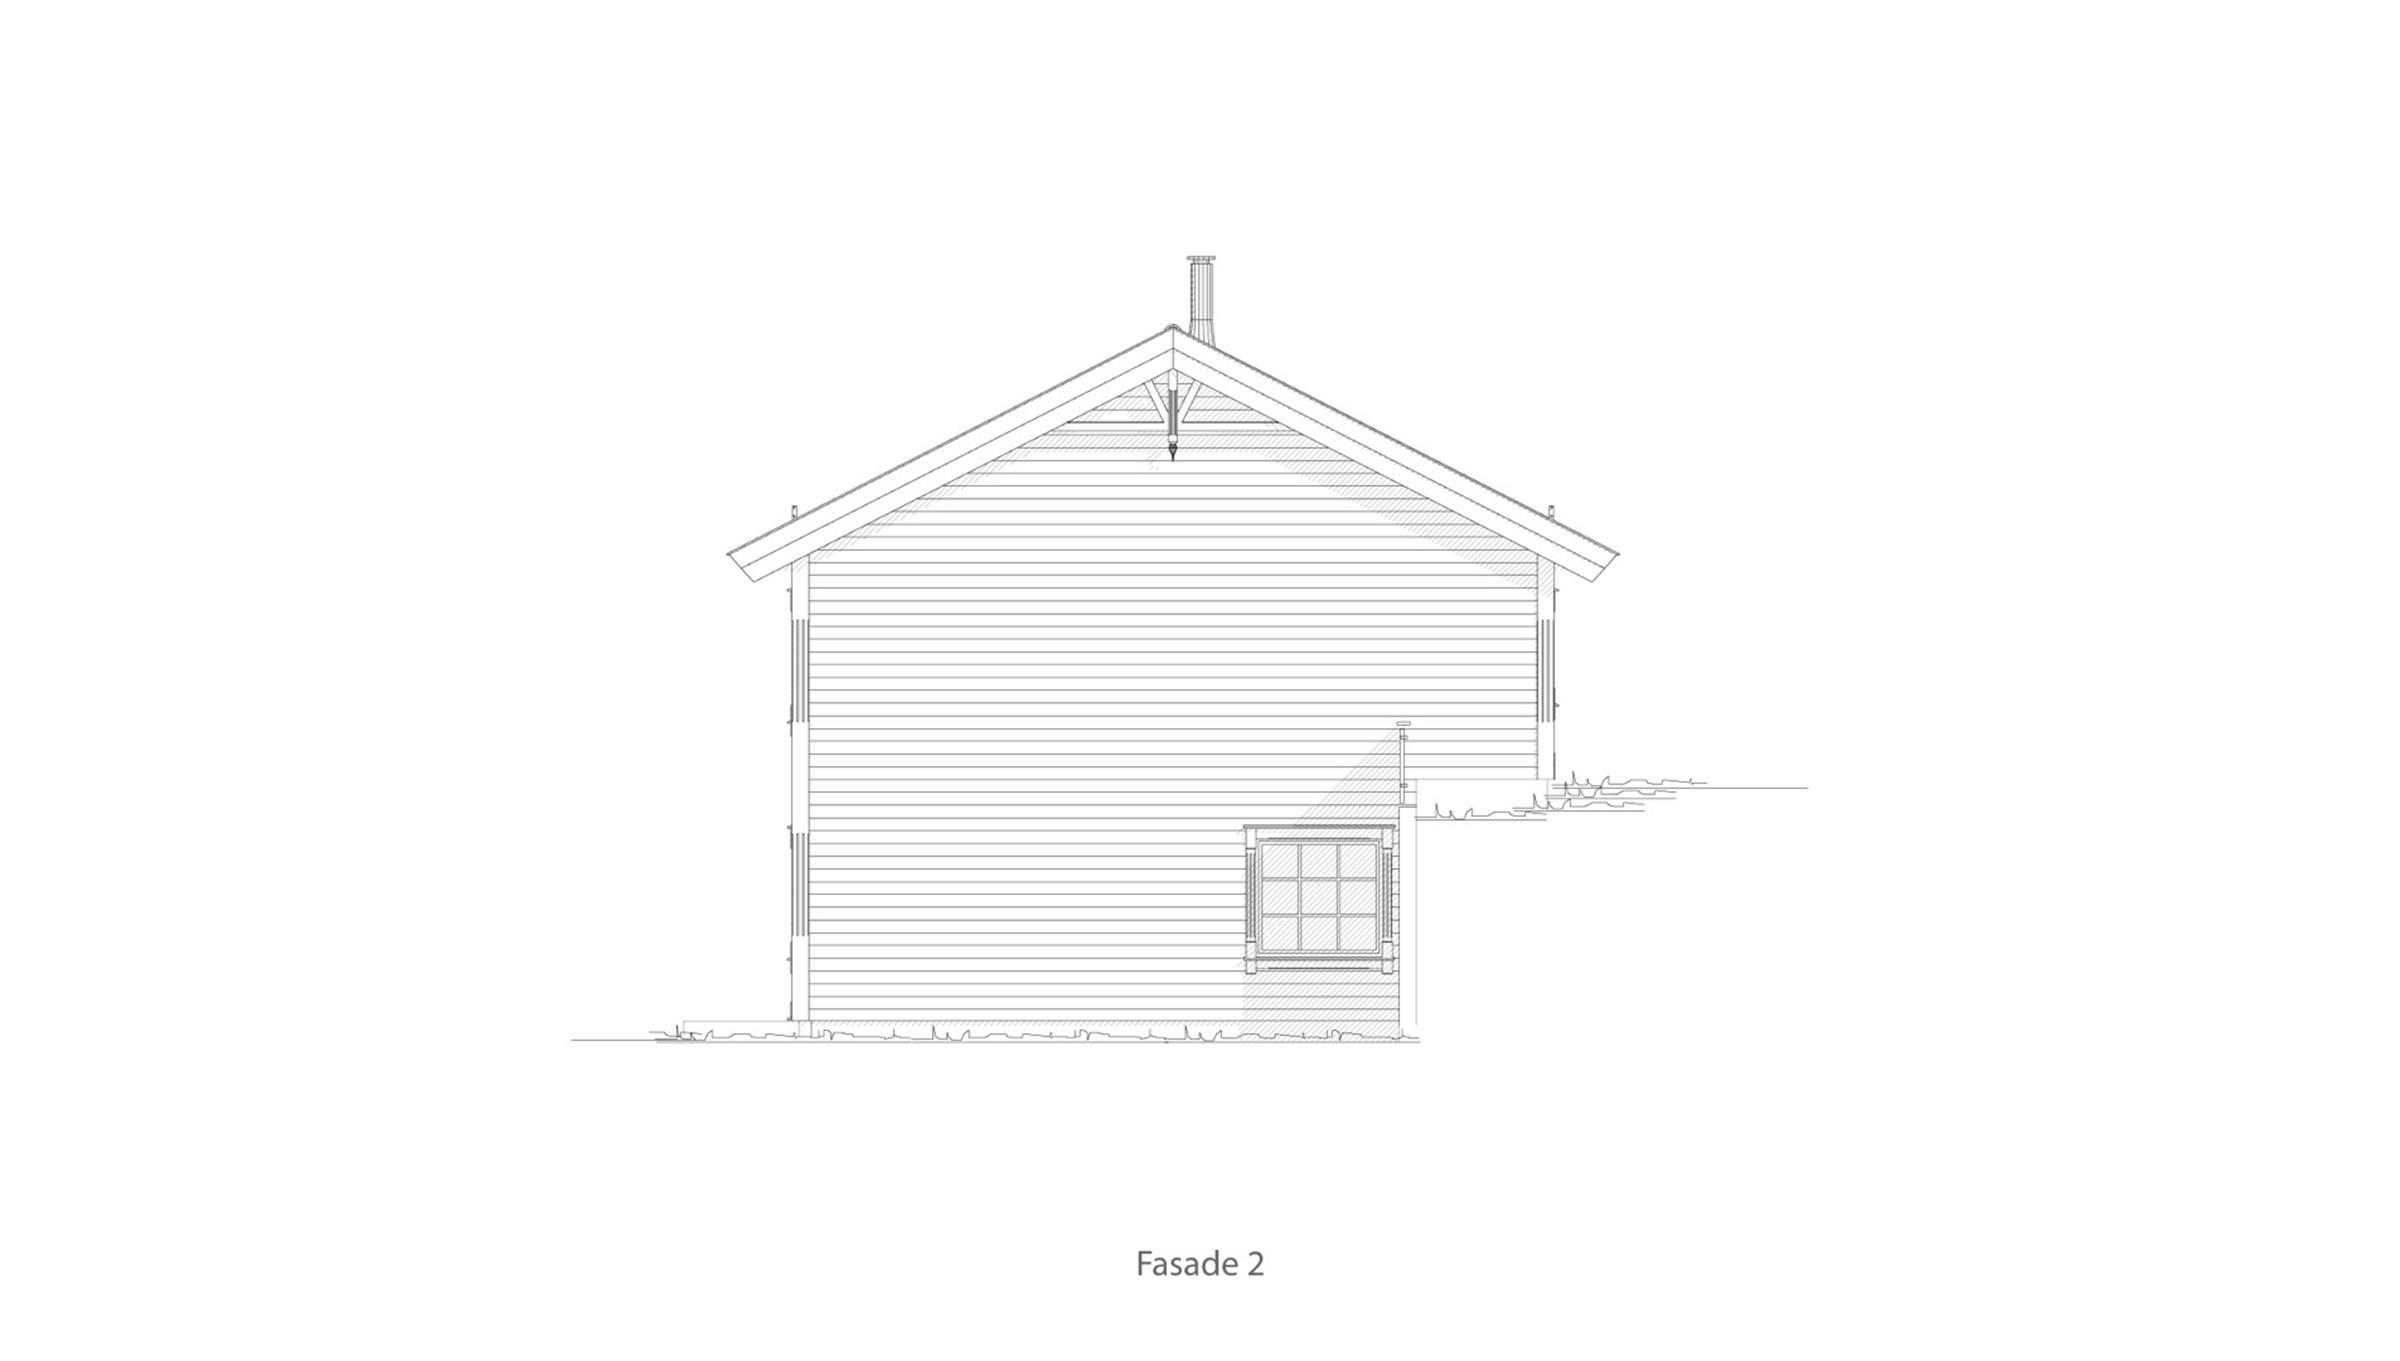 Sortland fasade 2